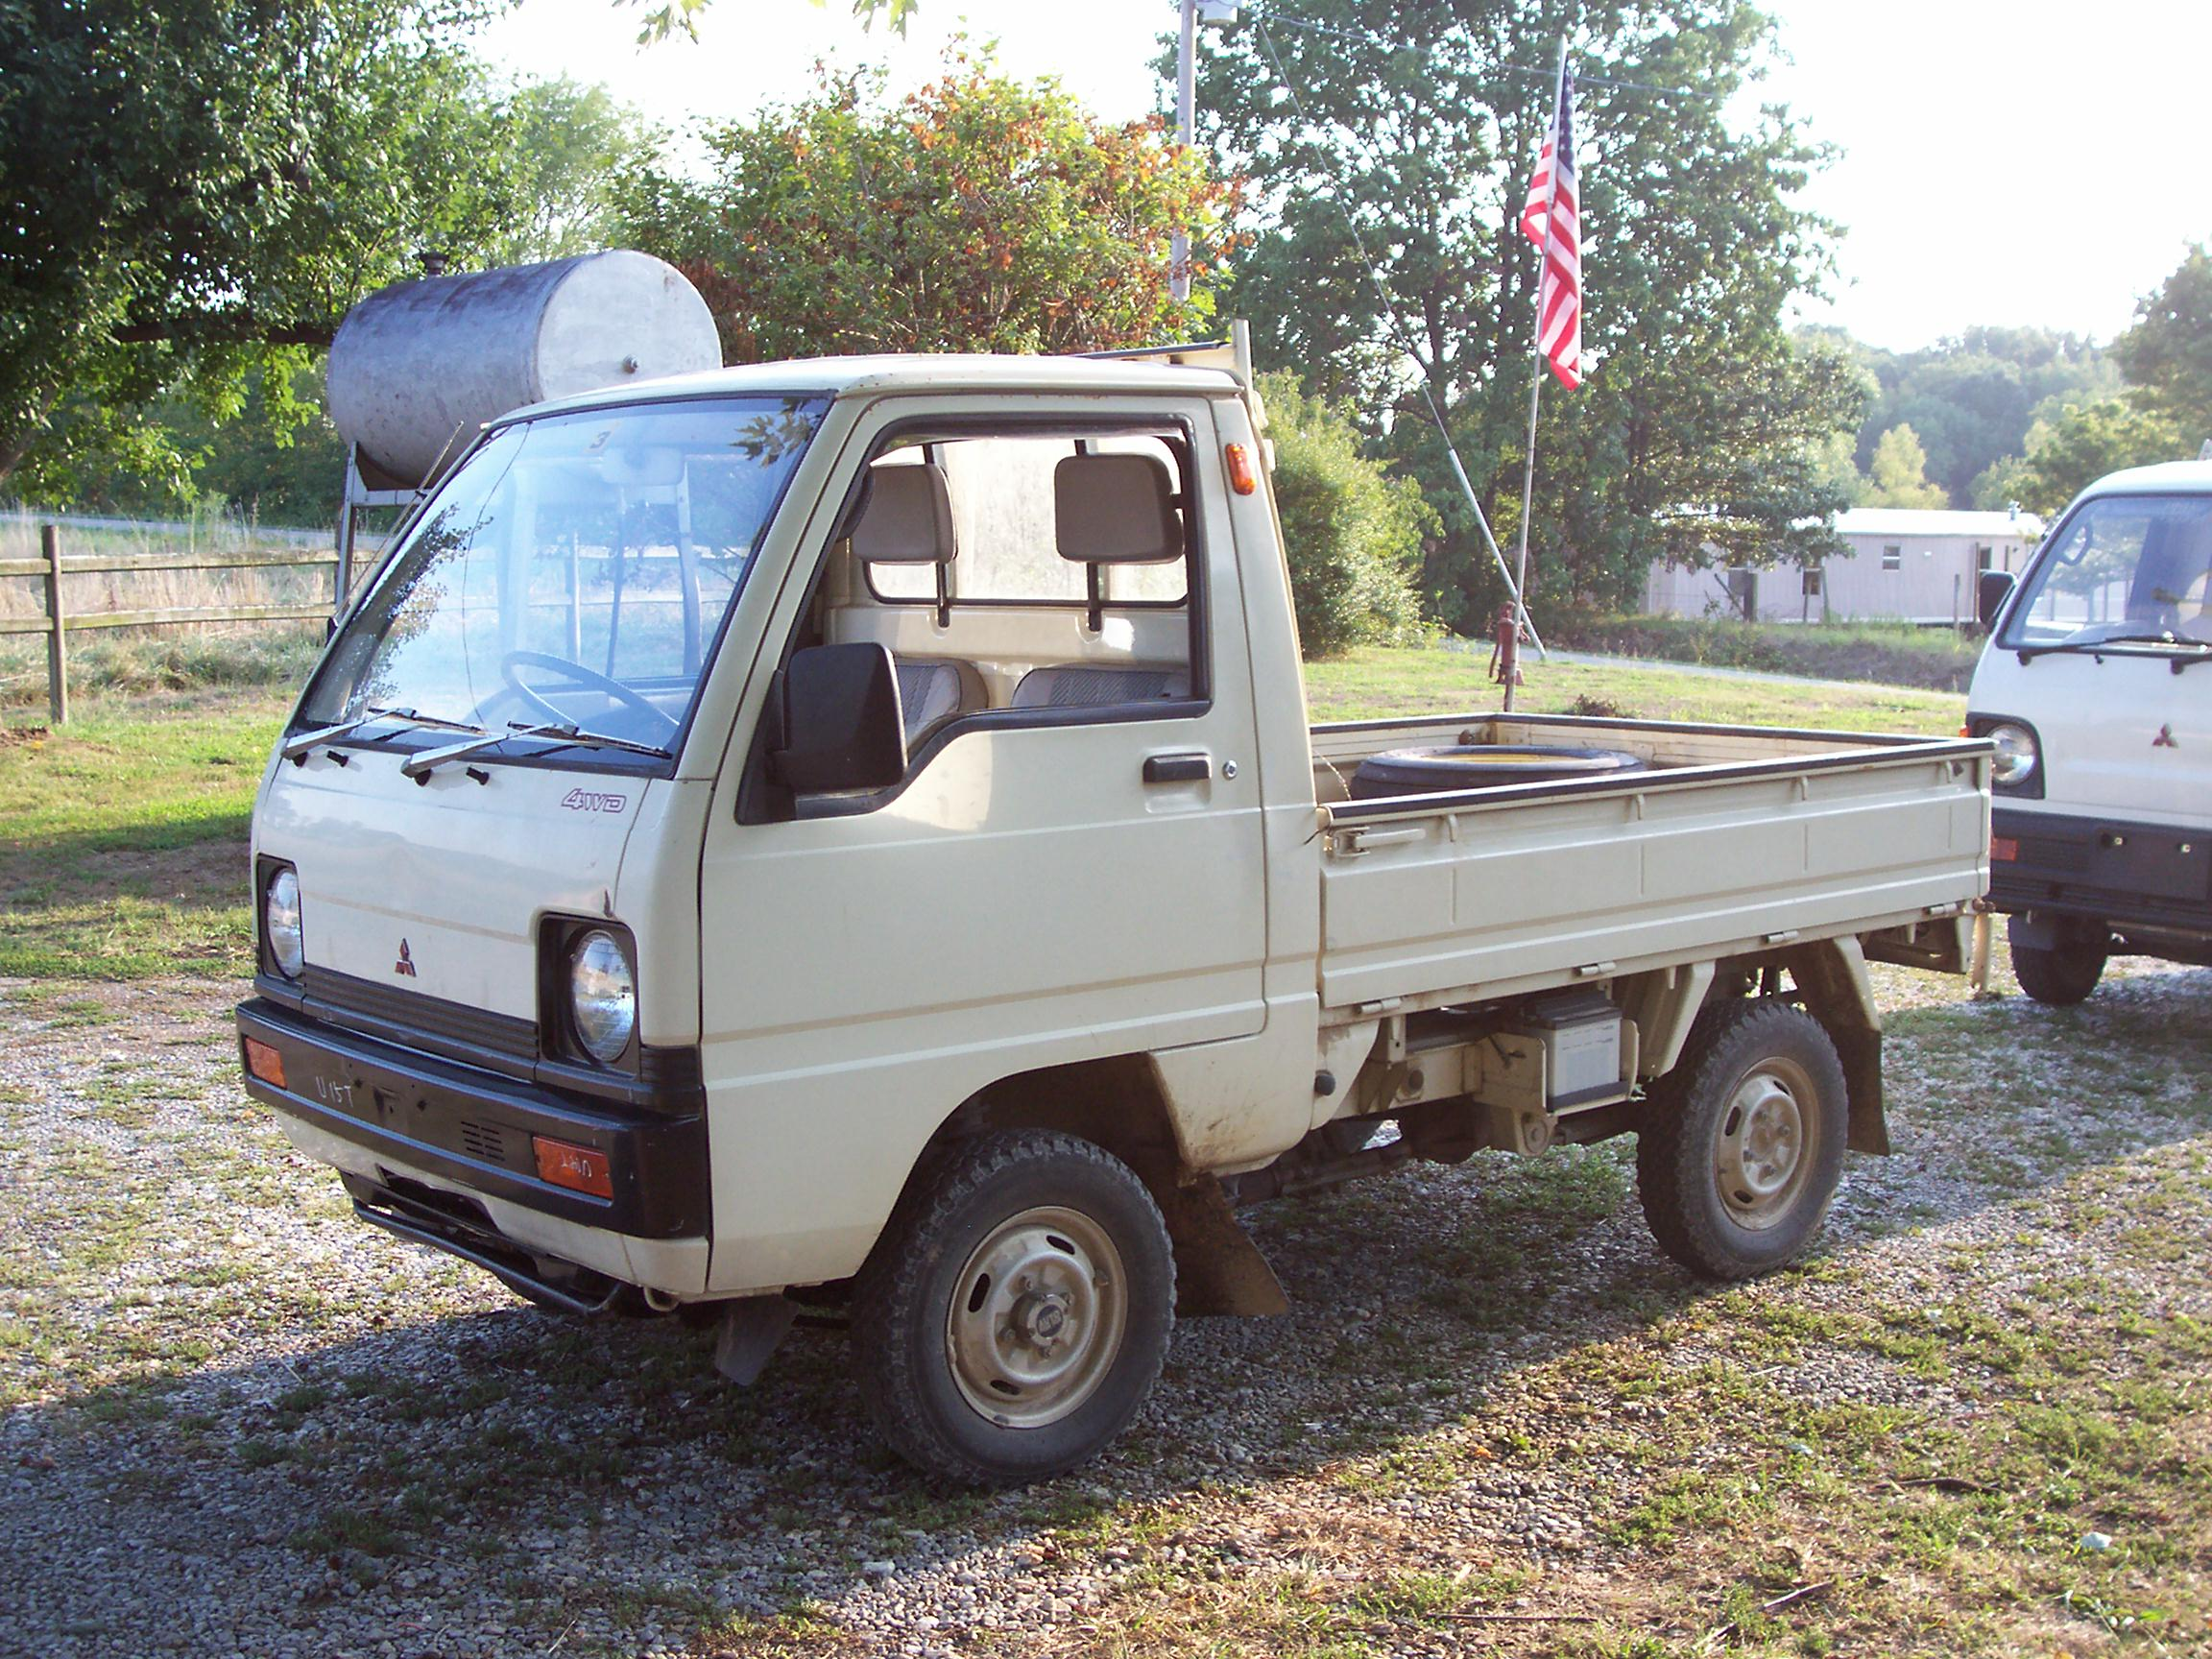 4x4 Off Road >> MacTown Mini Trucks Japanese Mini Truck 4x4 Kei Truck 4wd ATV Off Road Daihatsu Hijet Honda ...